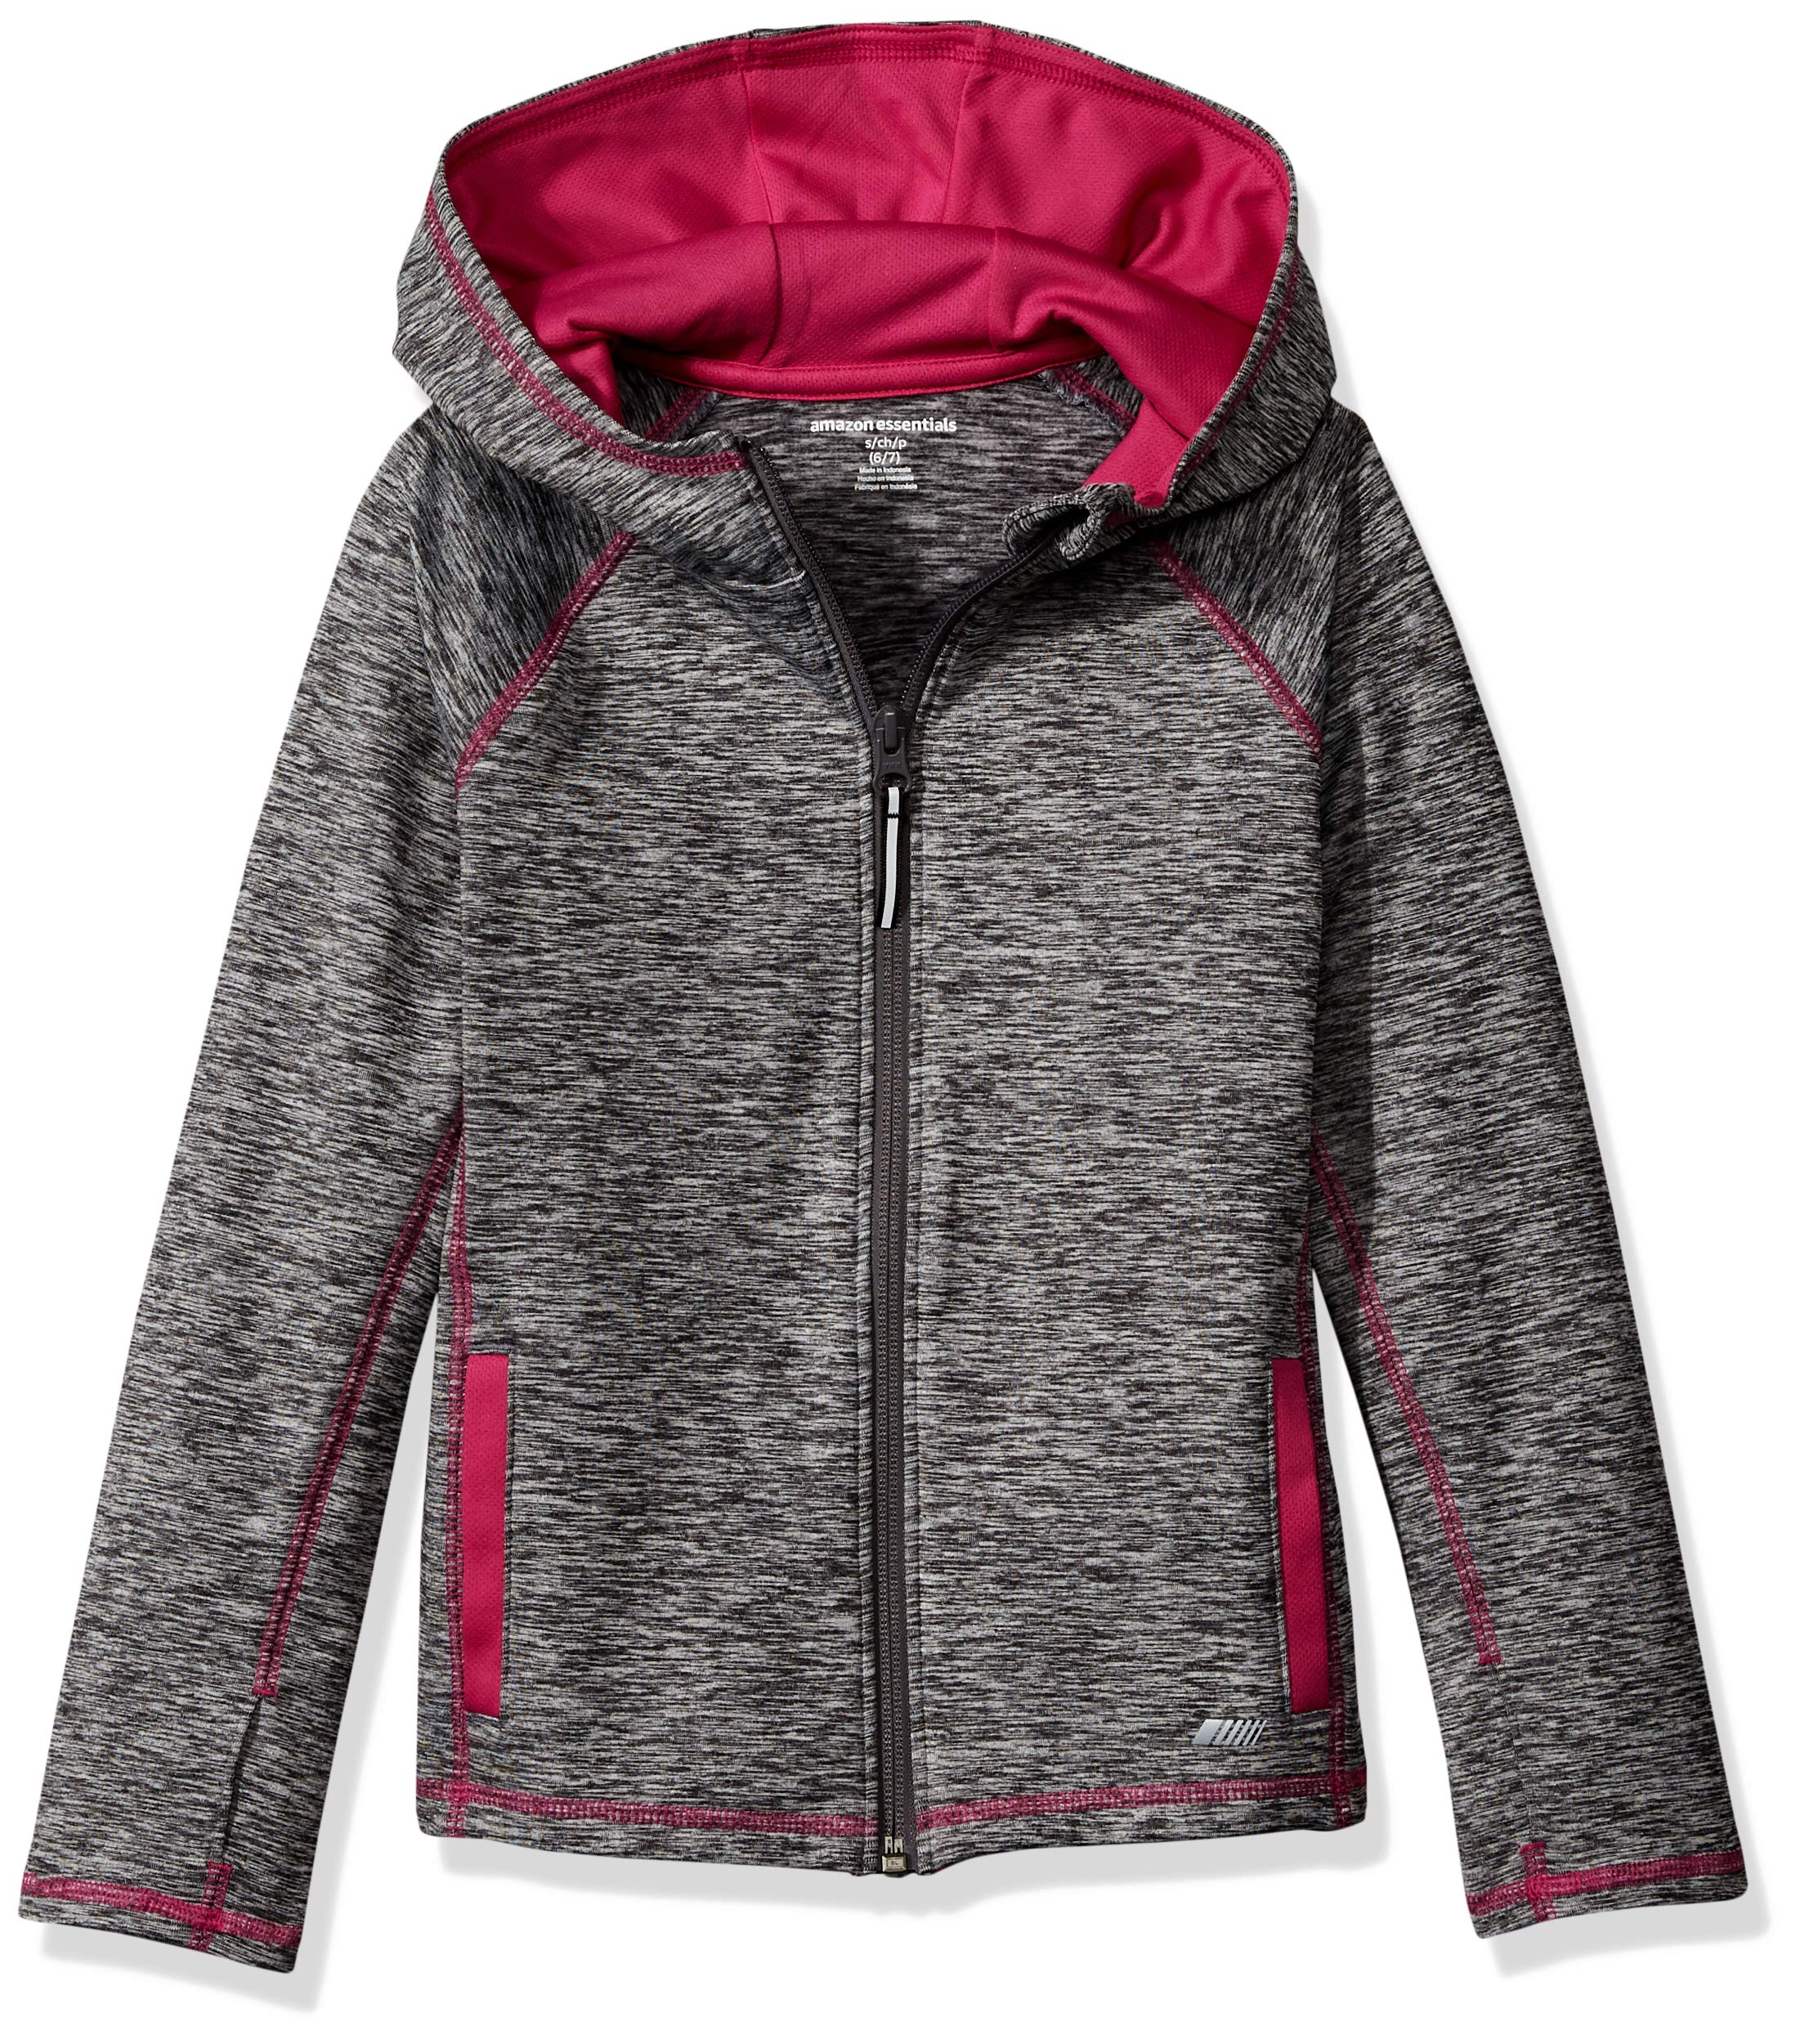 Amazon Essentials    Girls' Full-Zip Active Jacket, Grey Spacedye, S (6-7) by Amazon Essentials